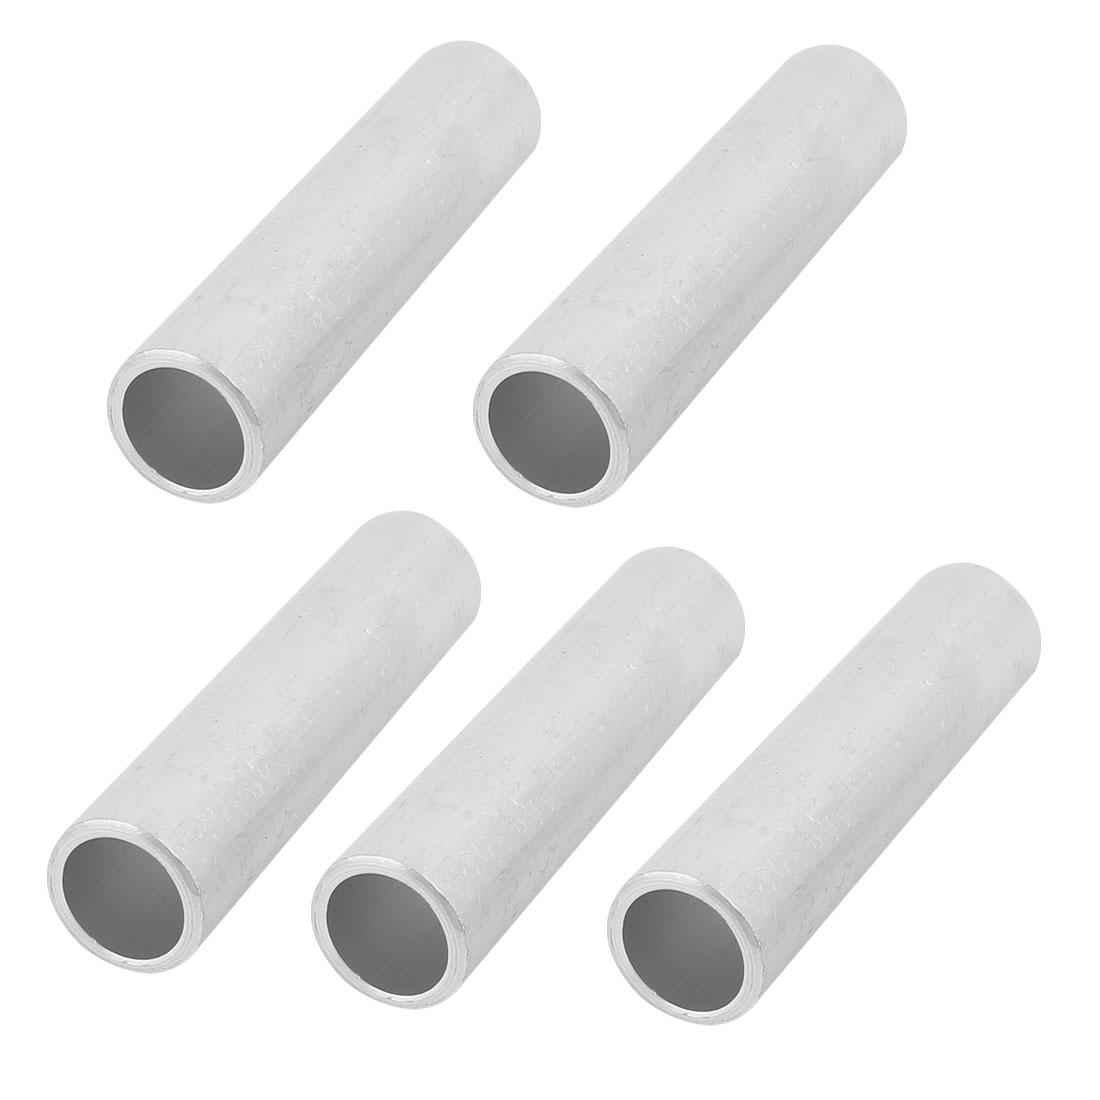 5Pcs Aluminium Tubular Inline Straight Connector Joint 21 x 27 x 111mm